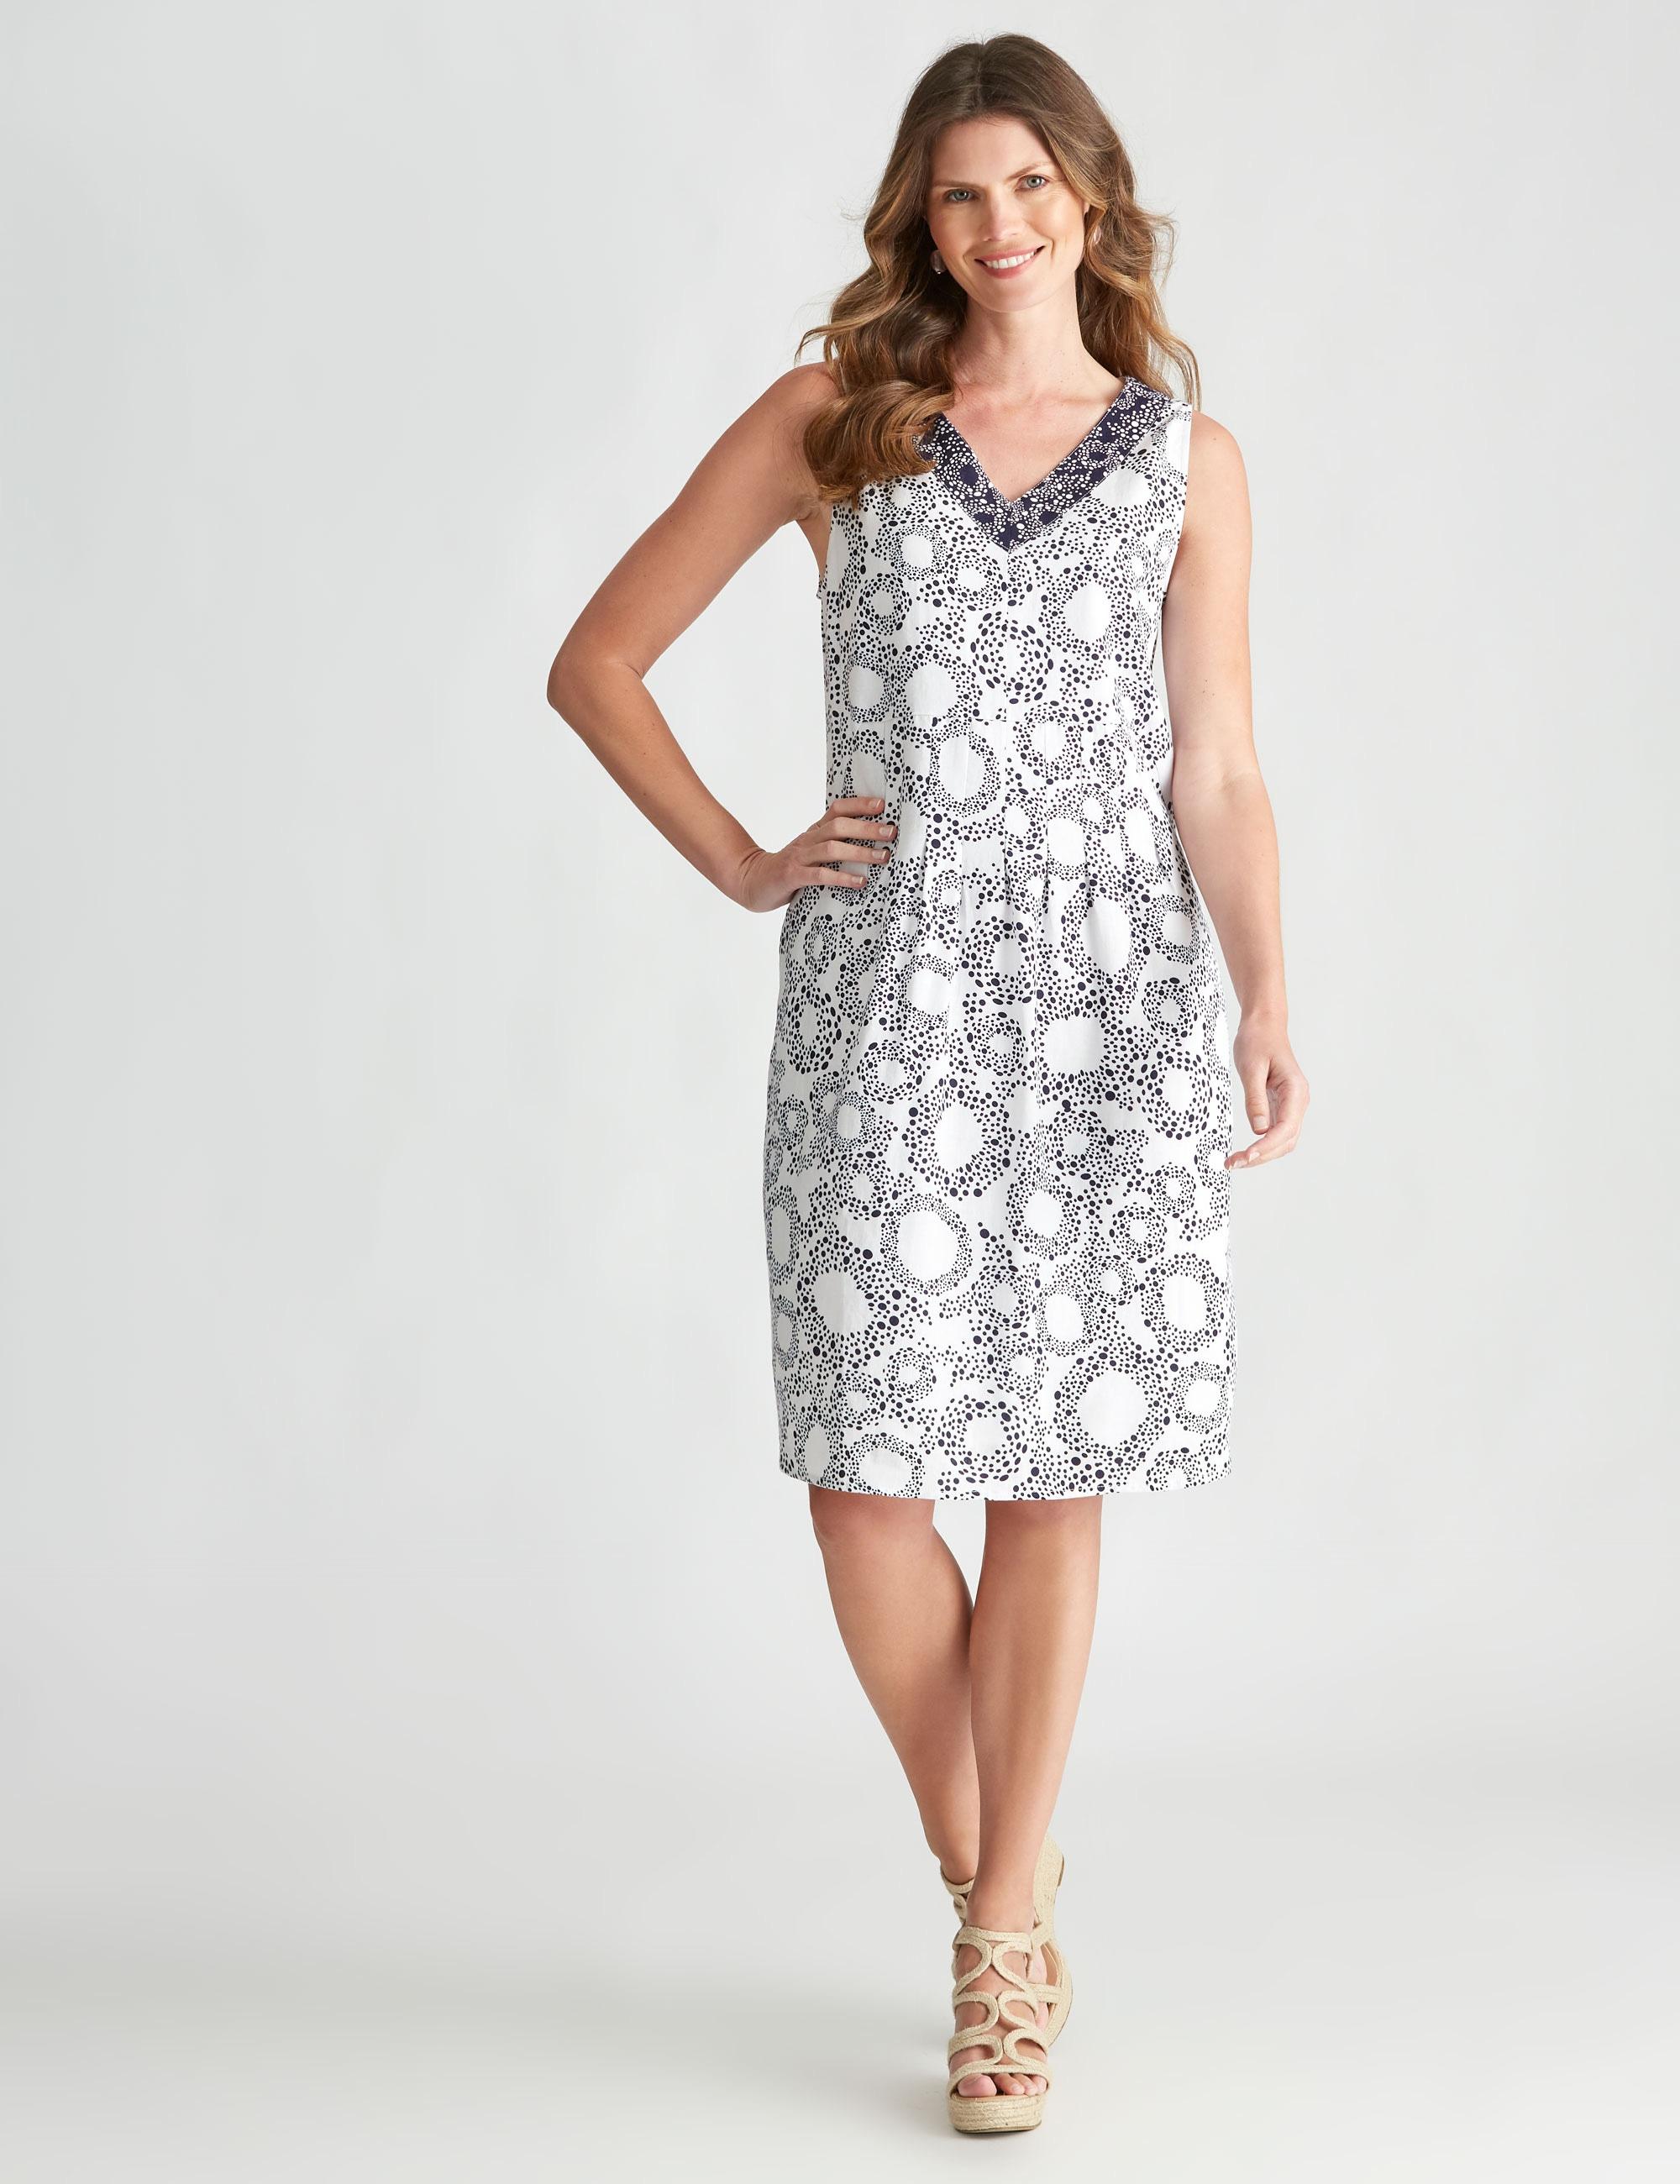 1055888900 3 - Women Fashion